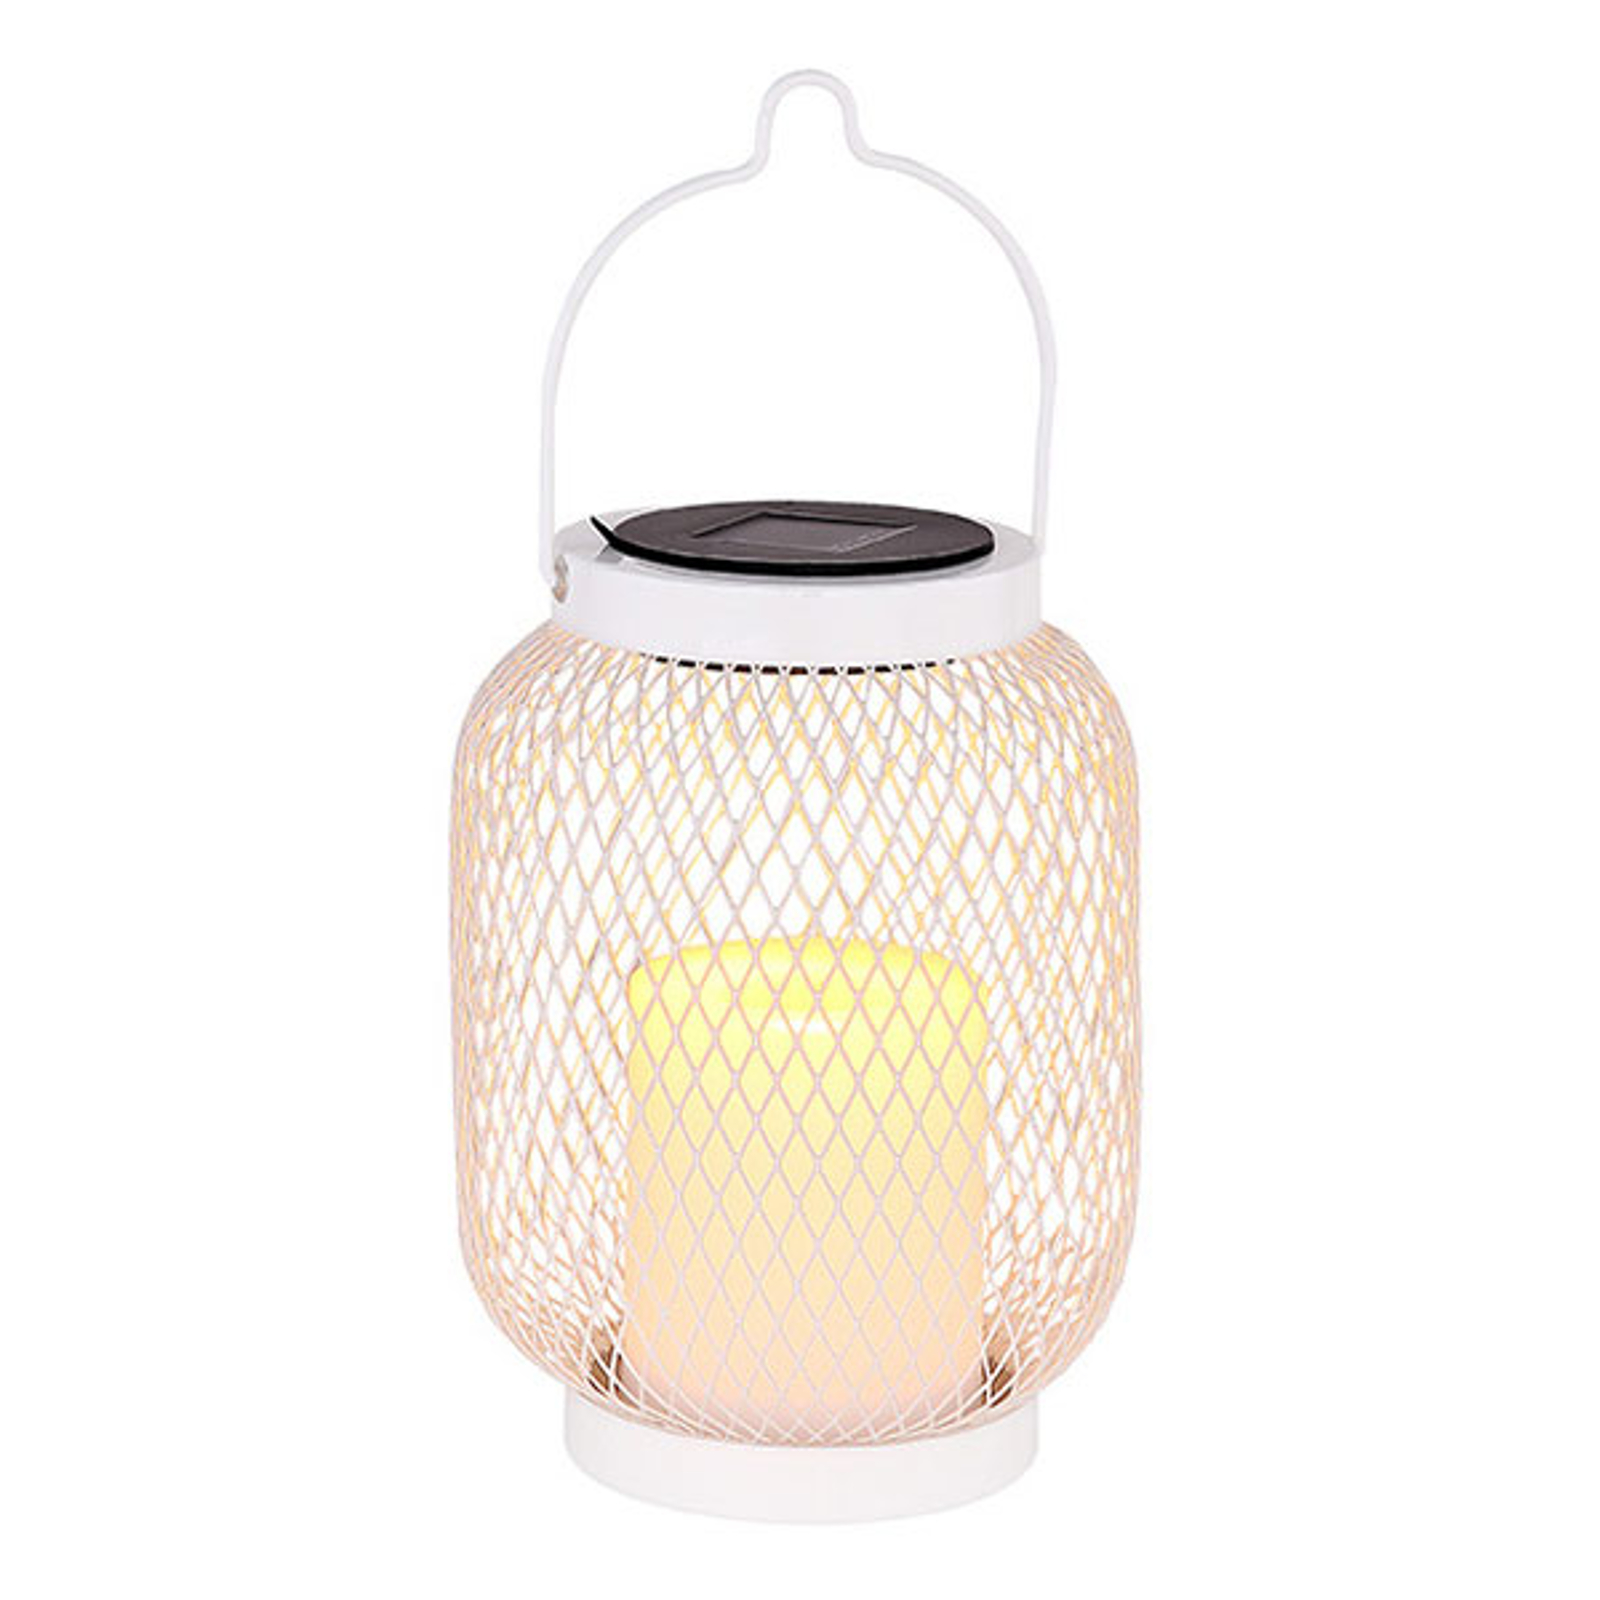 Solarna lampa wisząca LED 33542, latarnia biała